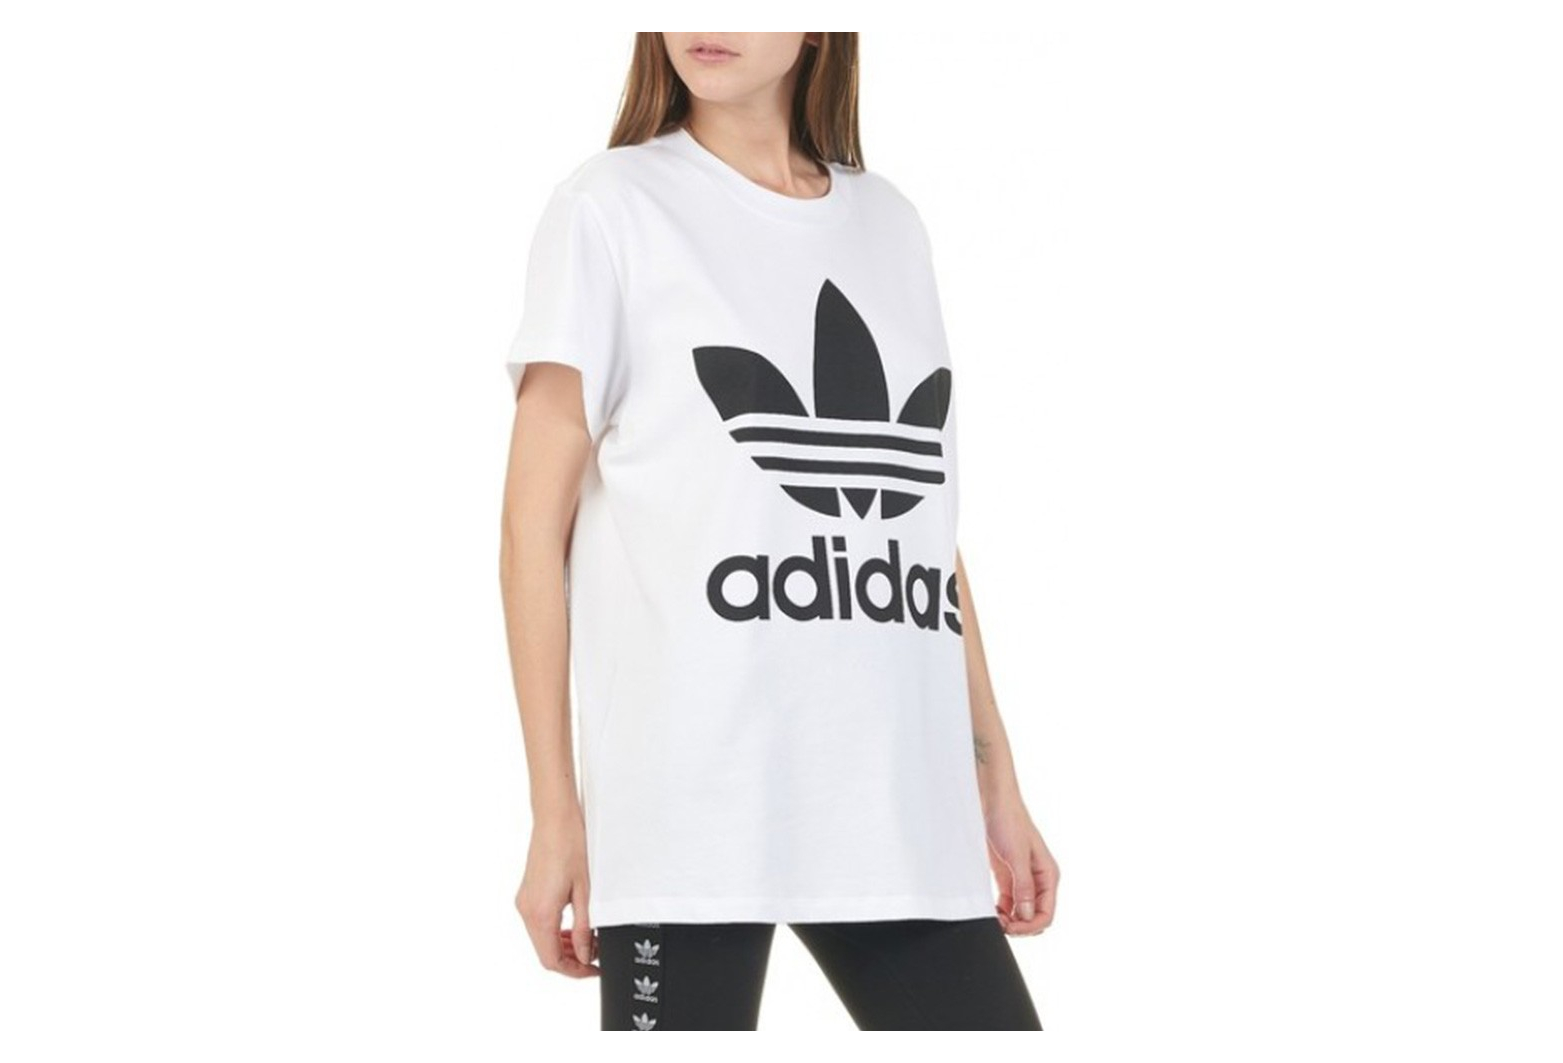 tee shirt blanc adidas femme